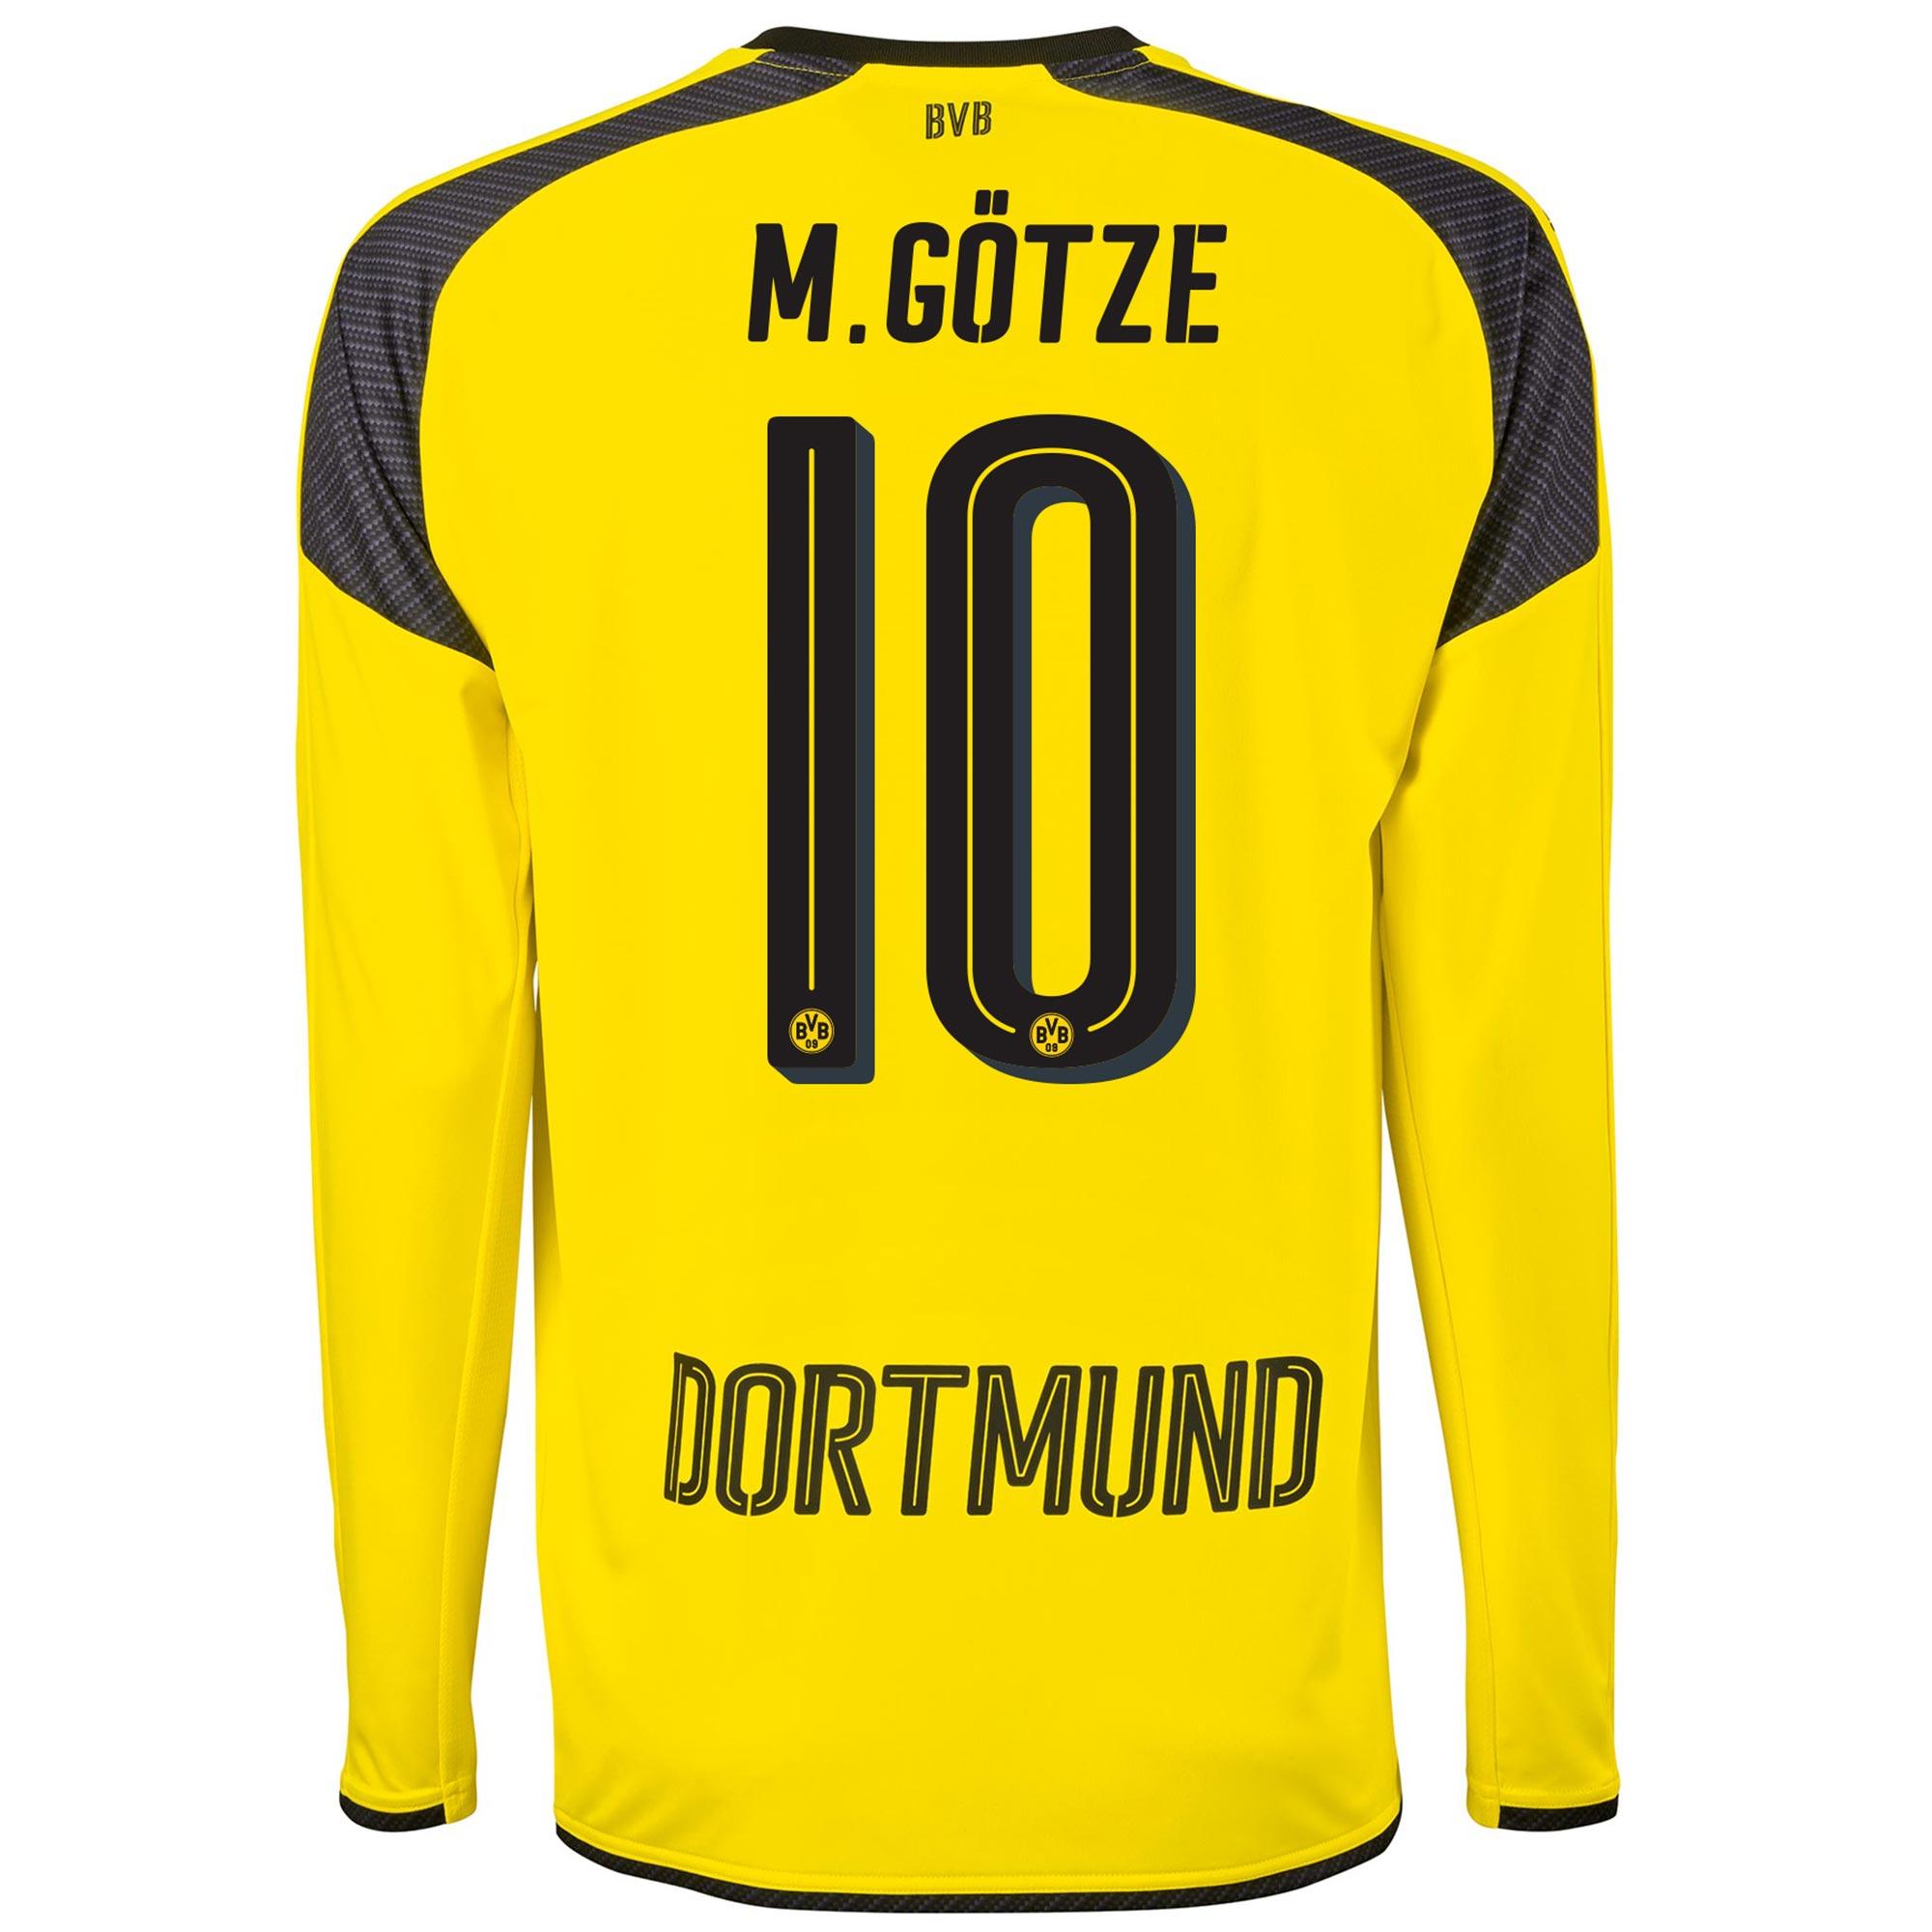 Image of BVB International Home Shirt 2016-17 - Long Sleeve with M. Götze 10 pr, N/A